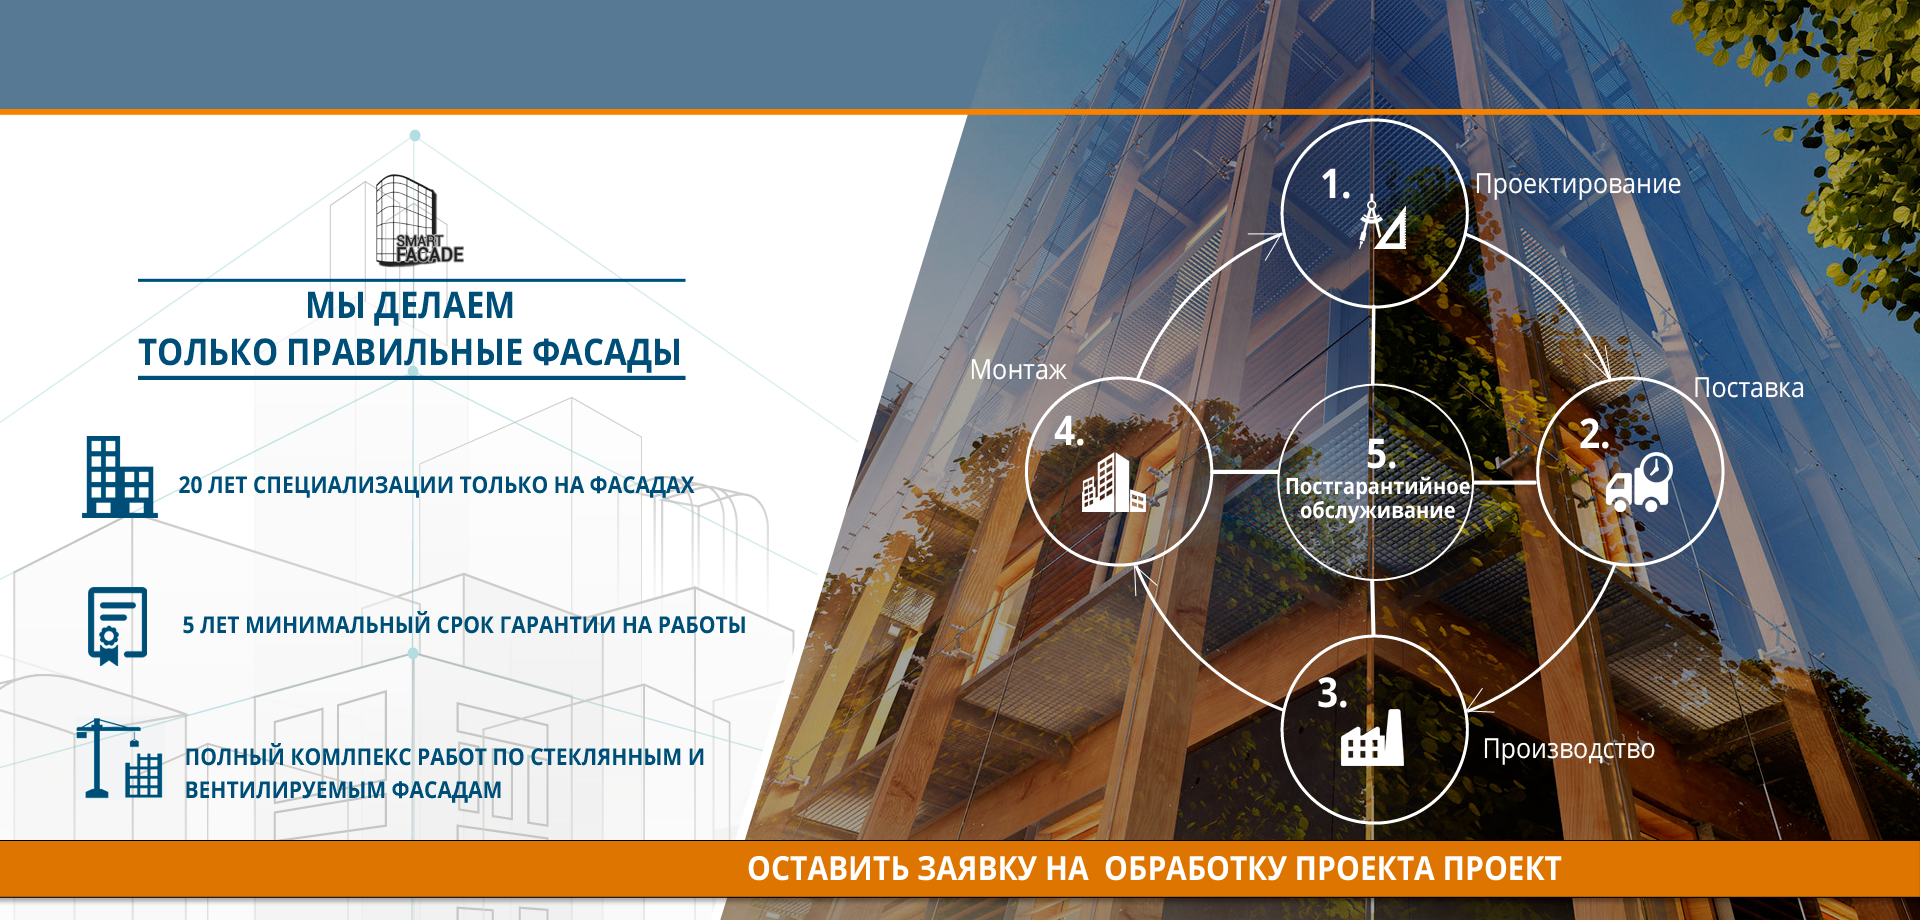 smartfacade-lp-21-10-15